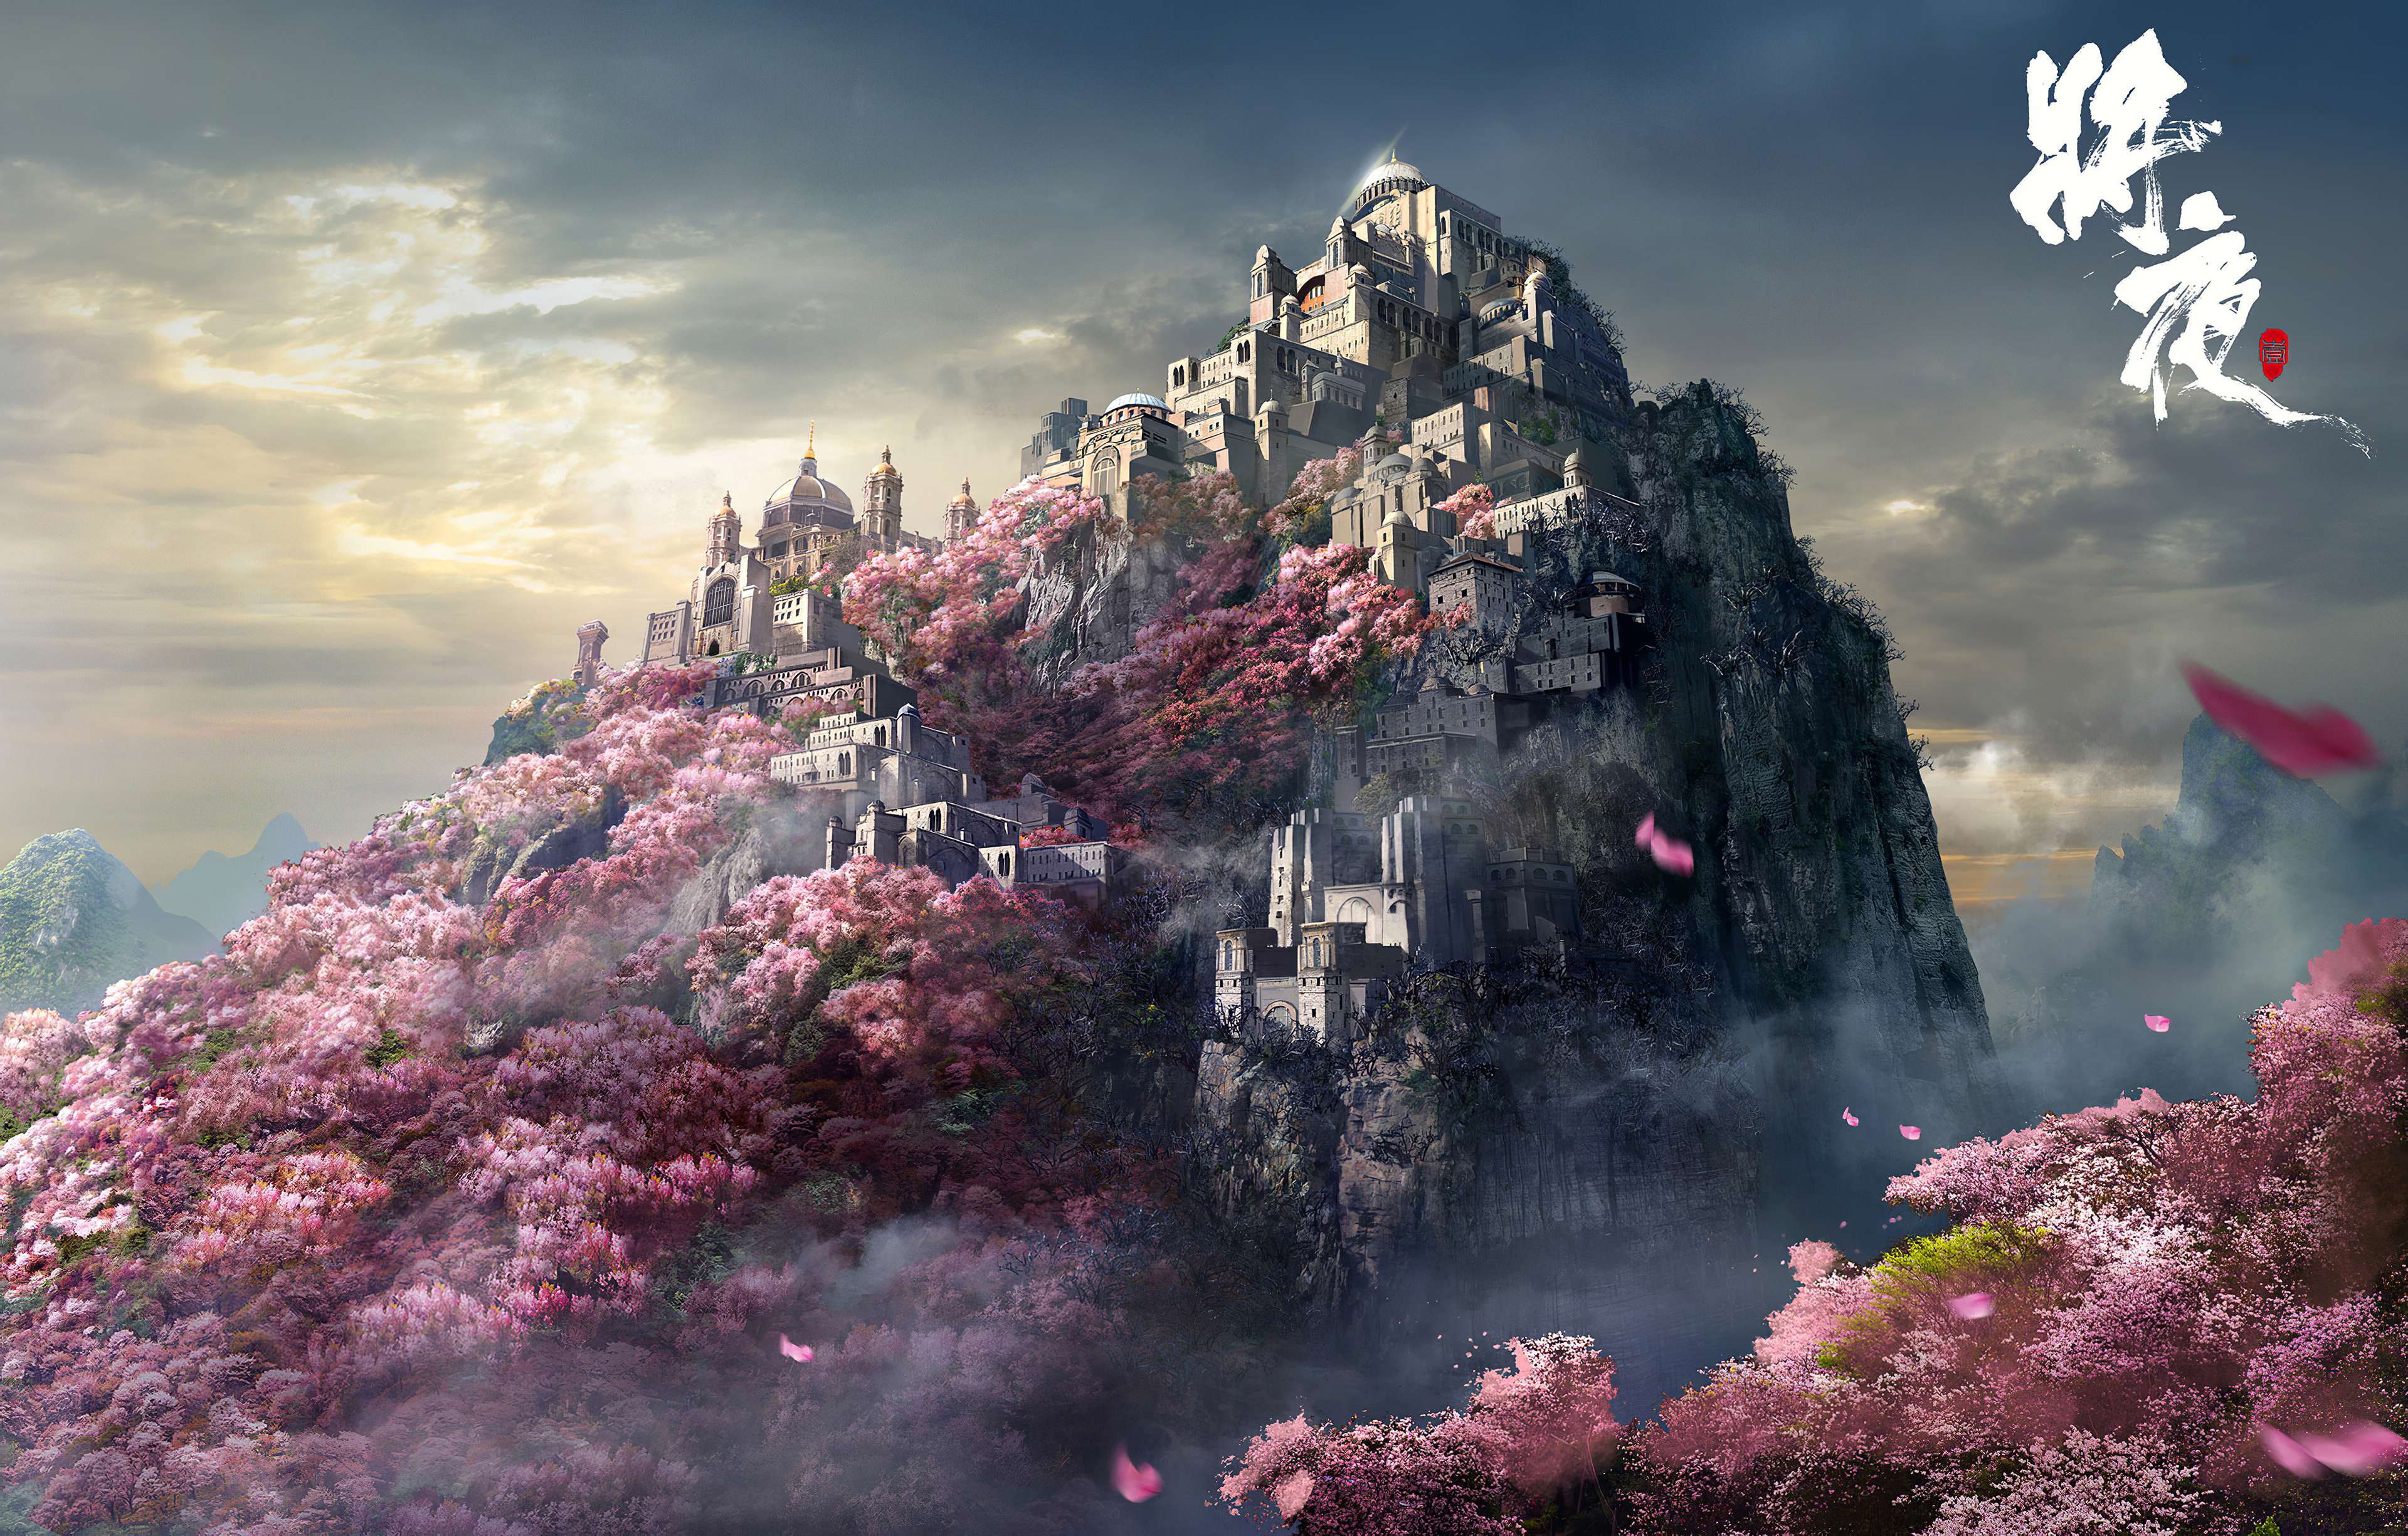 Mountain Castle Japan 4k, HD Artist, 4k Wallpapers, Images ...